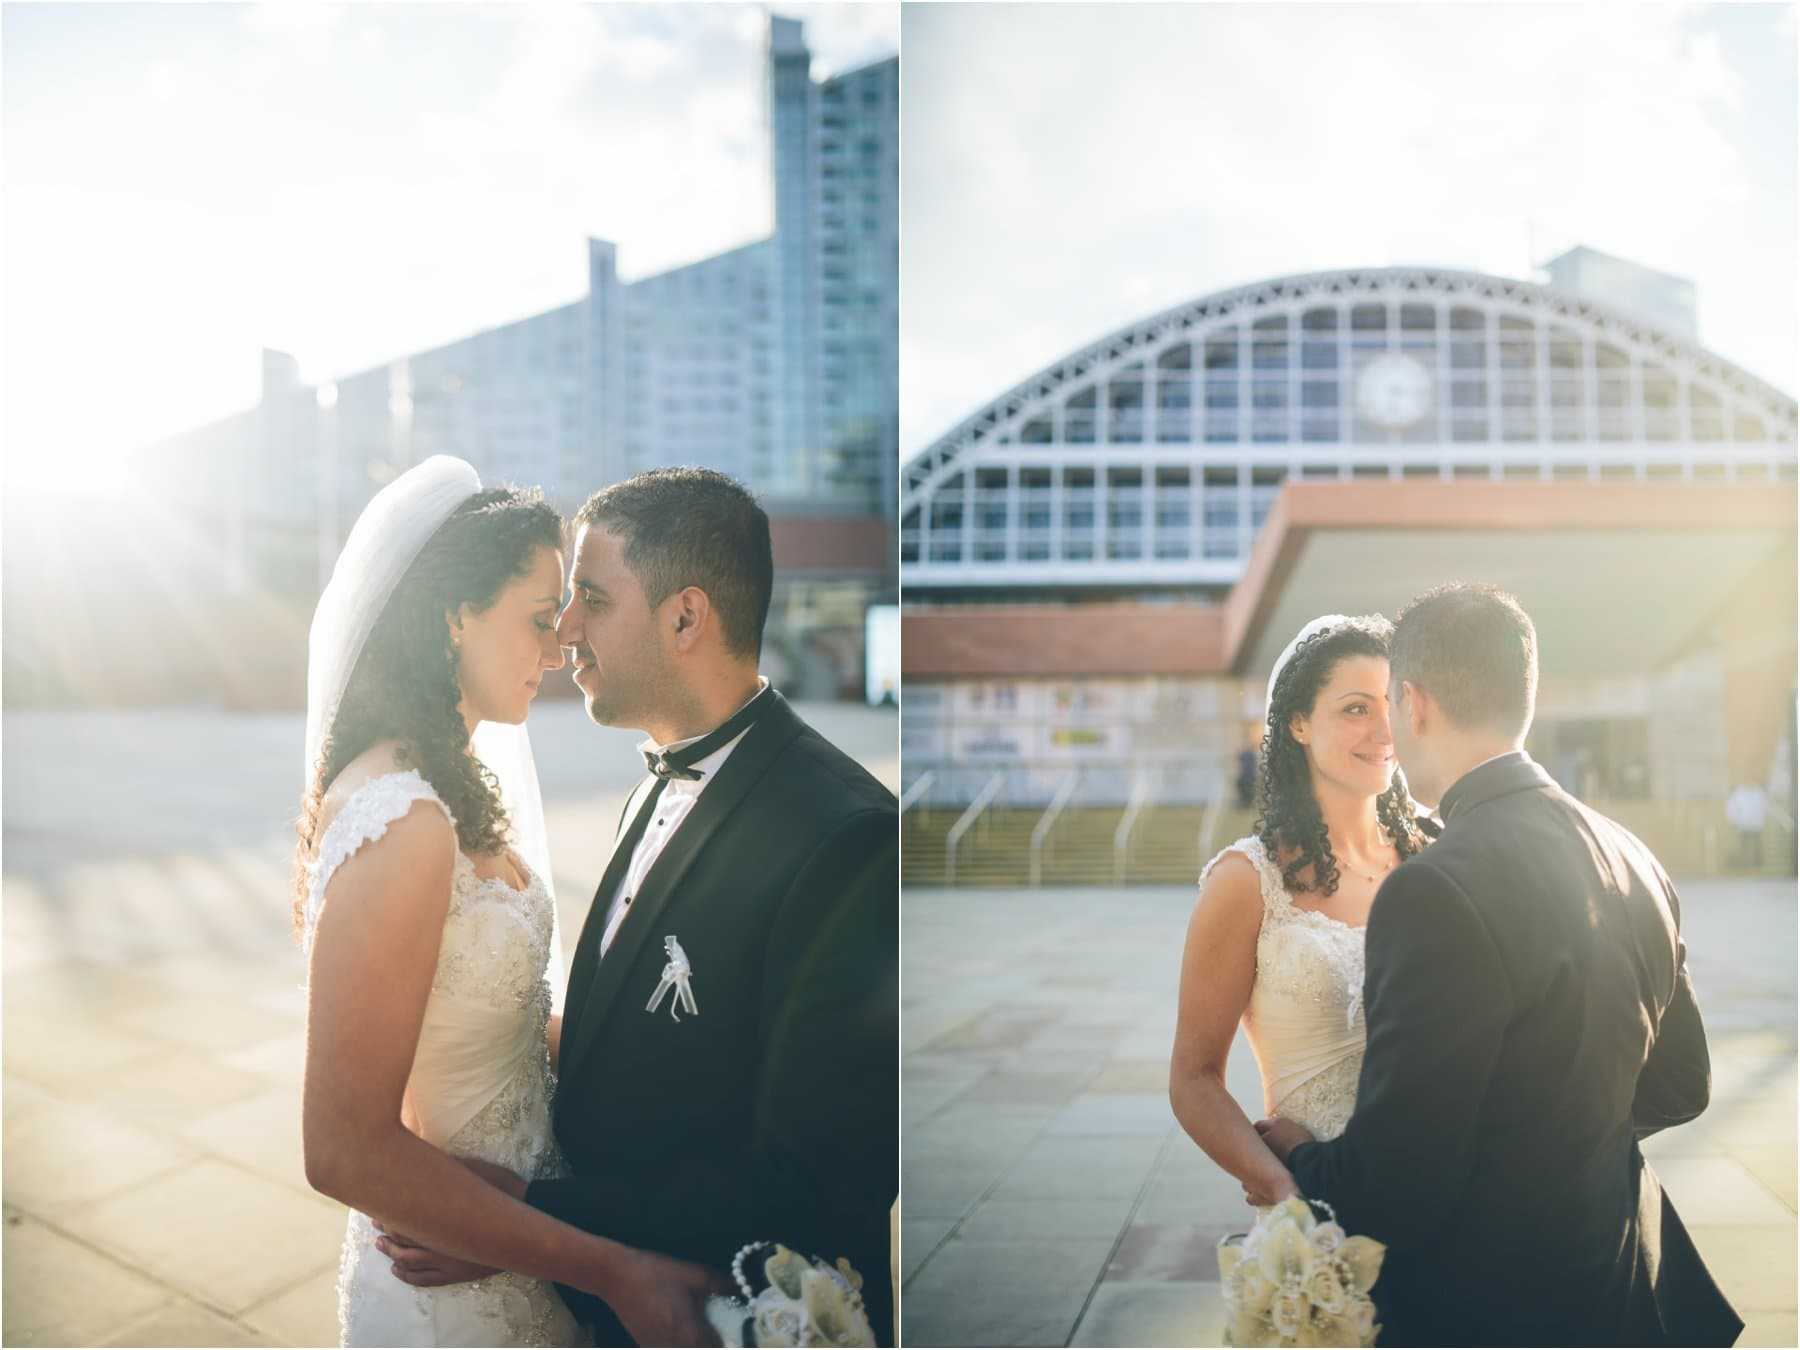 Midland_Manchester_Wedding_Photography_0087